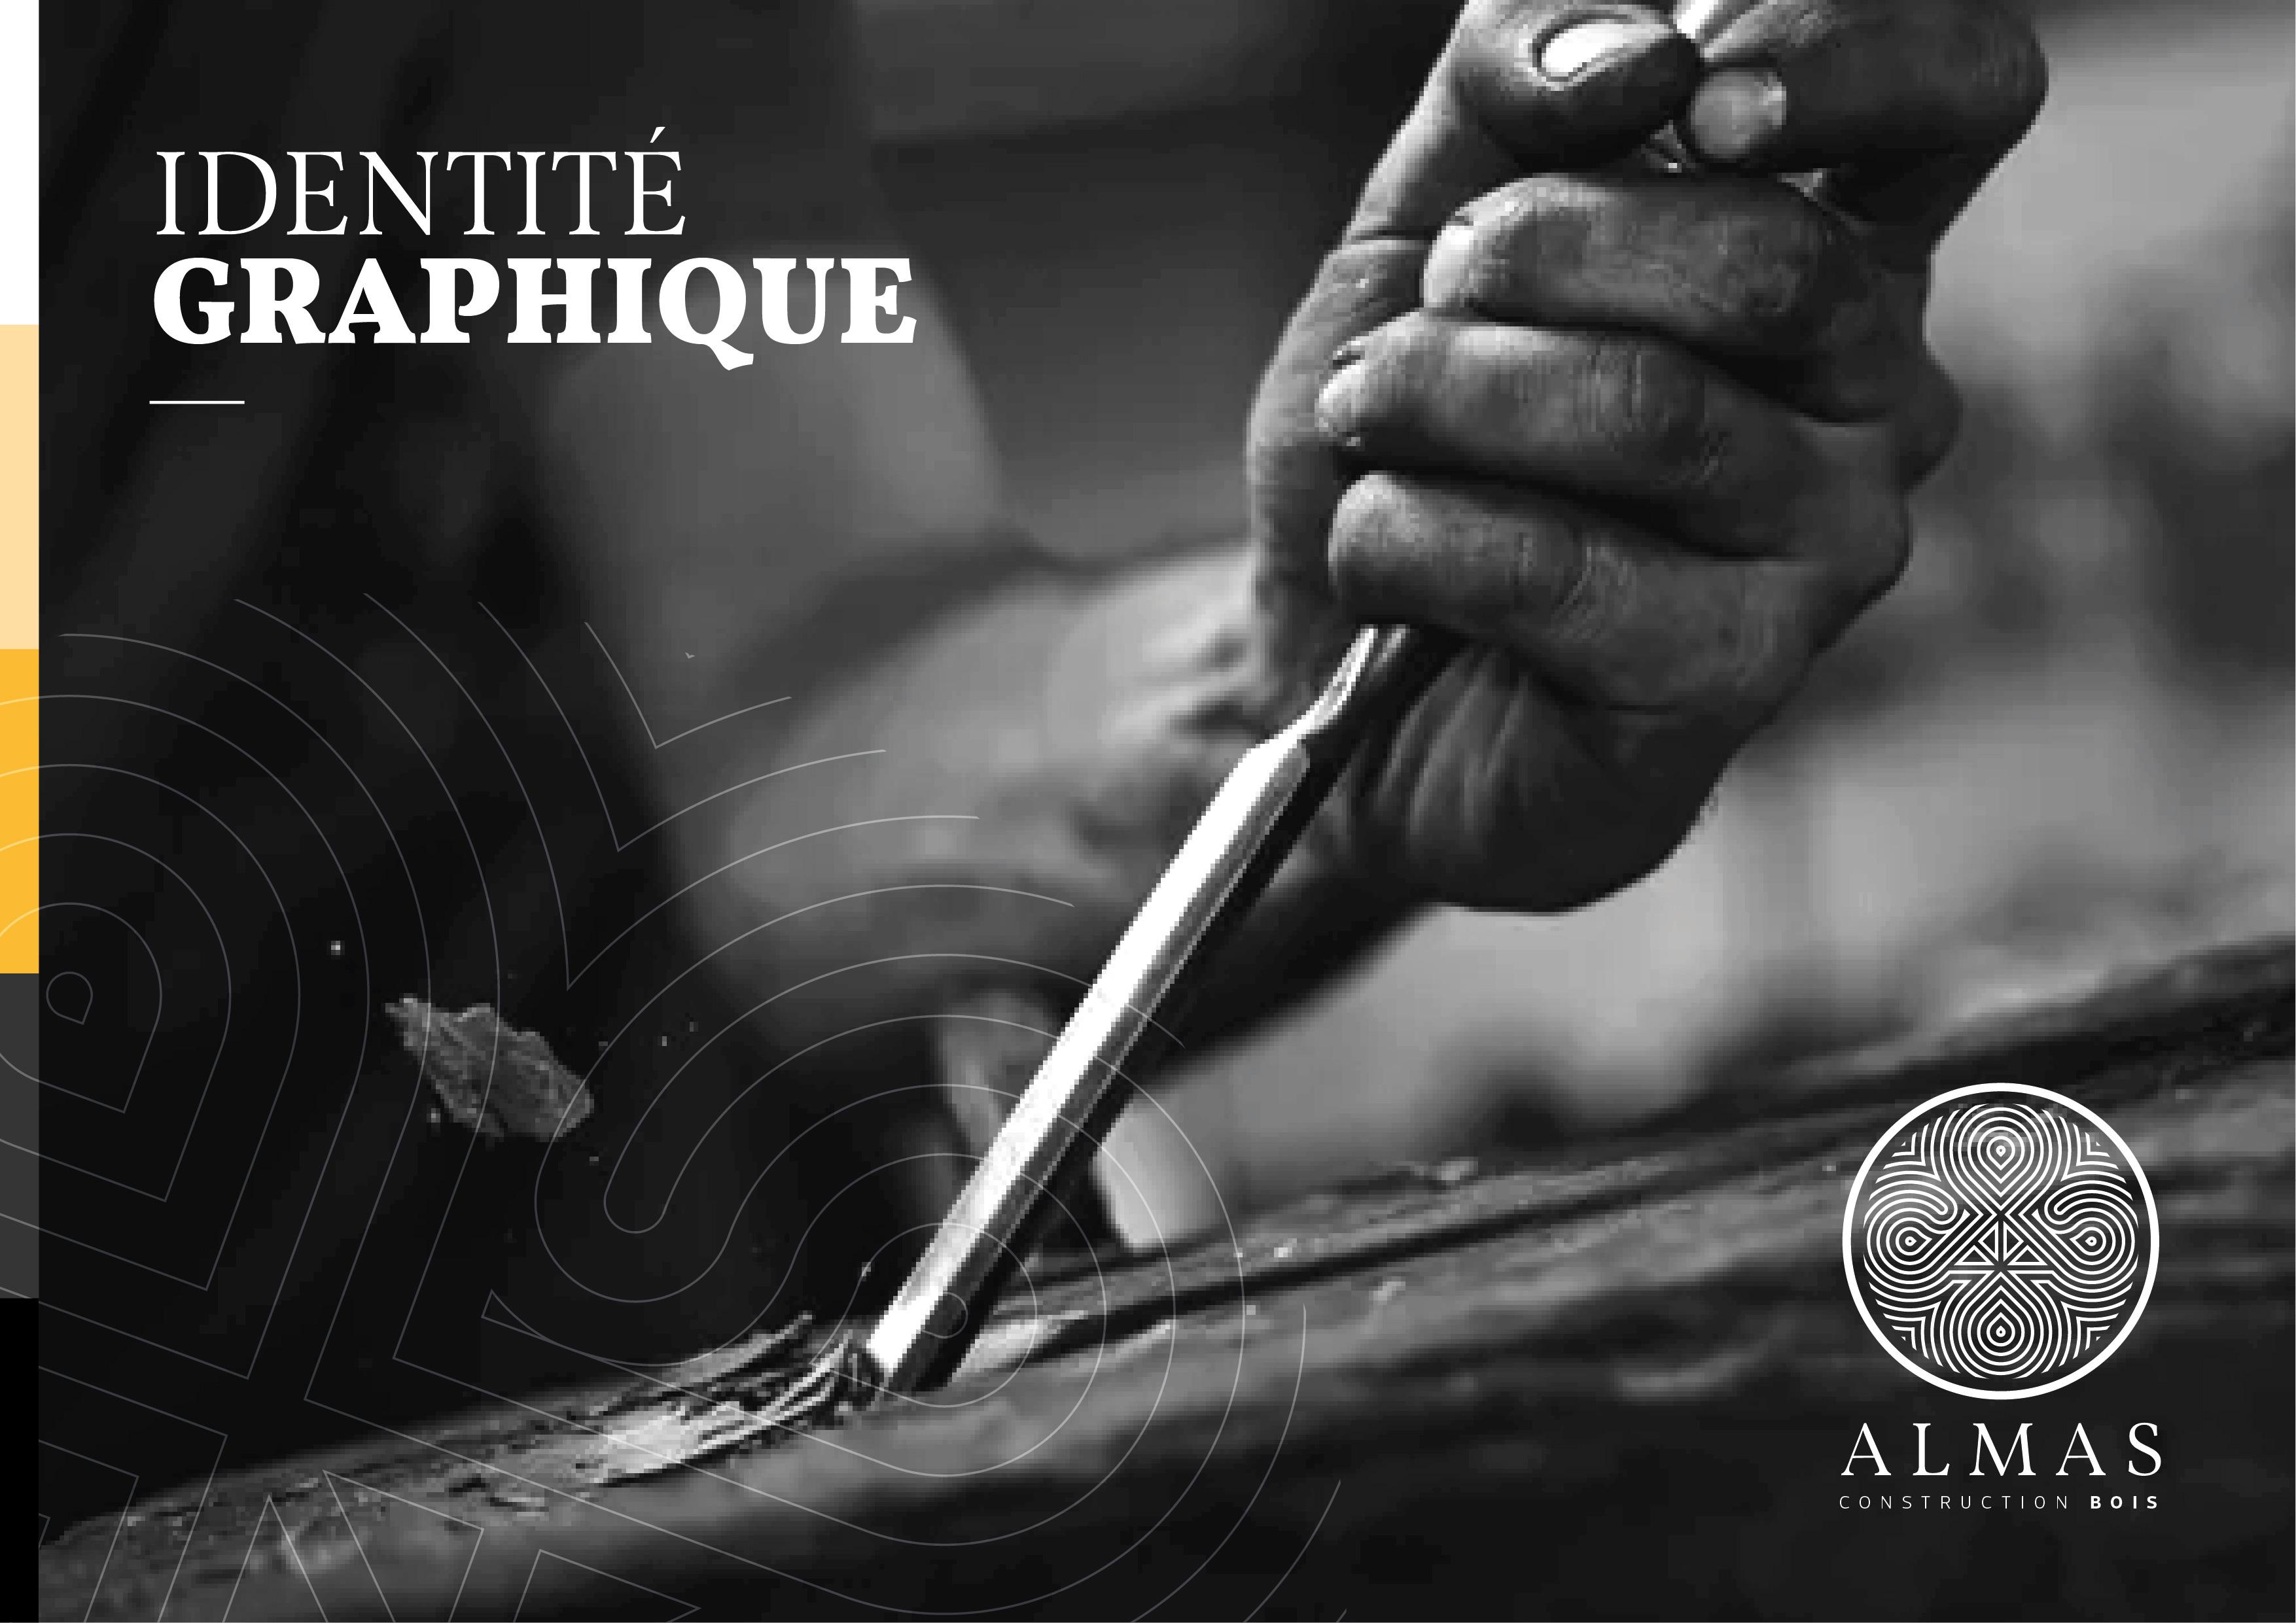 IDENTITE ALMAS - CHARTE GRAPHIQUE-01